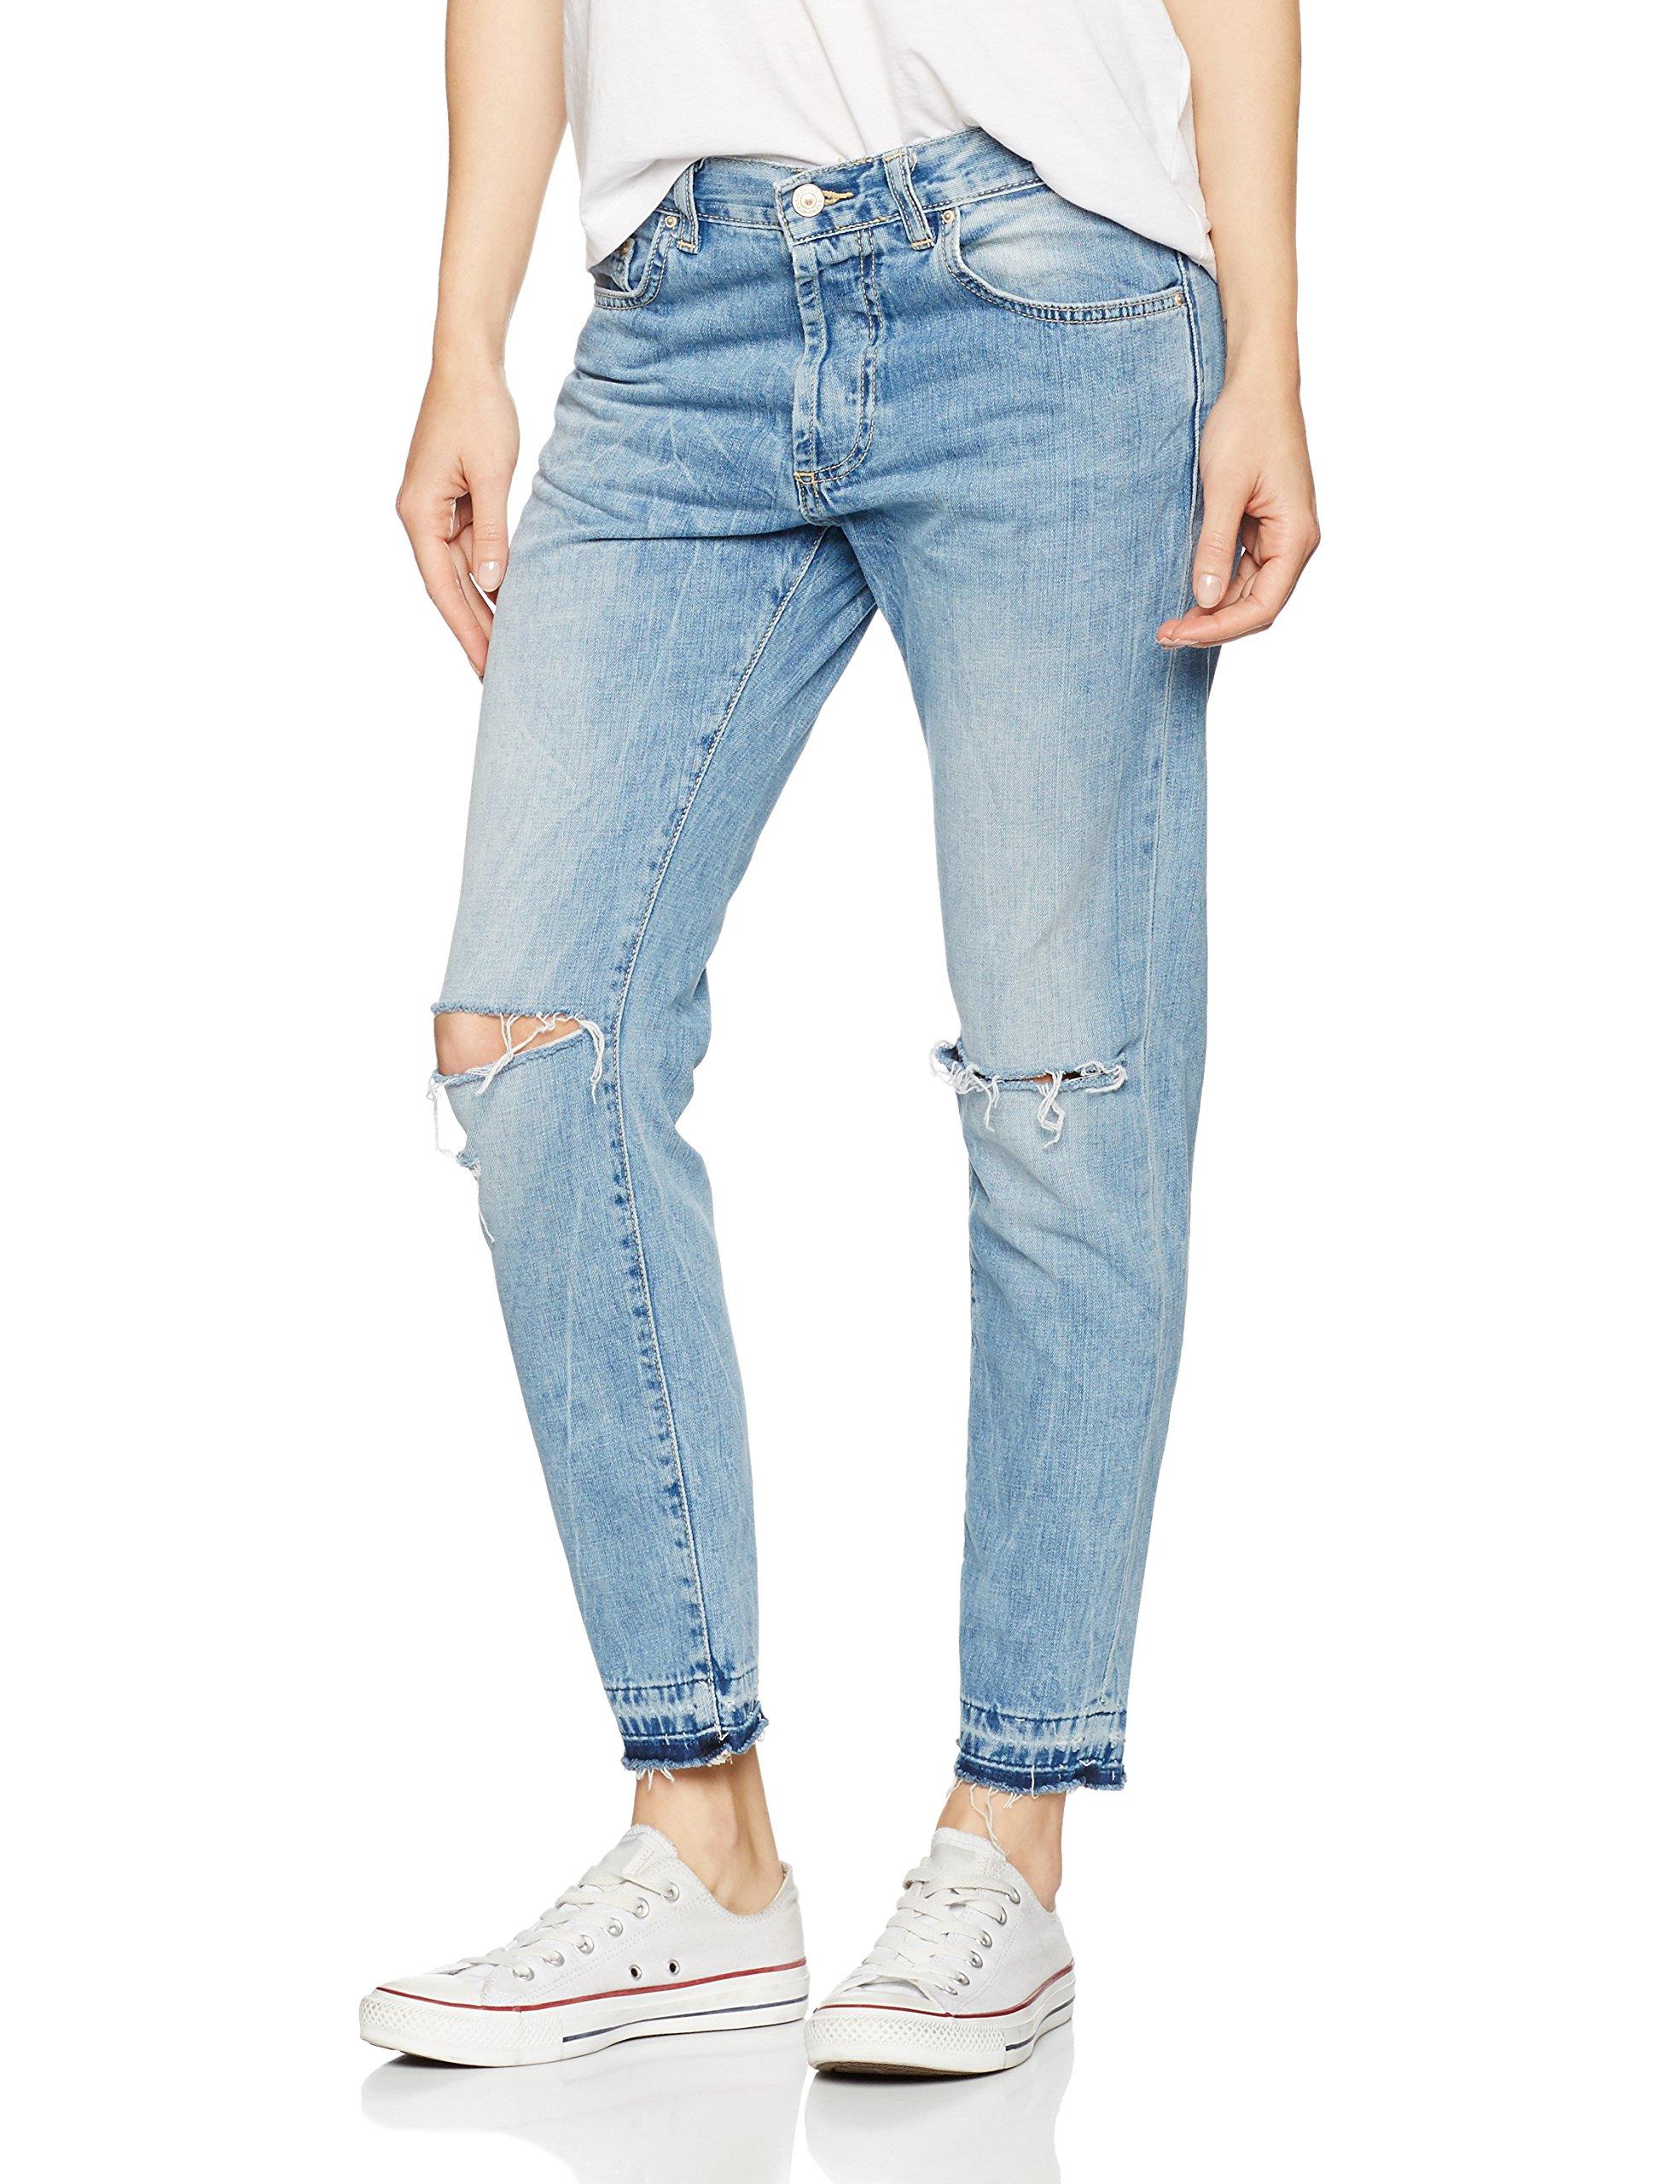 Wash Ltb BoyfriendBlauivanov Jeans Jean Nicka 5104929wtaille Fabricant29Femme 0kNwOX8nPZ